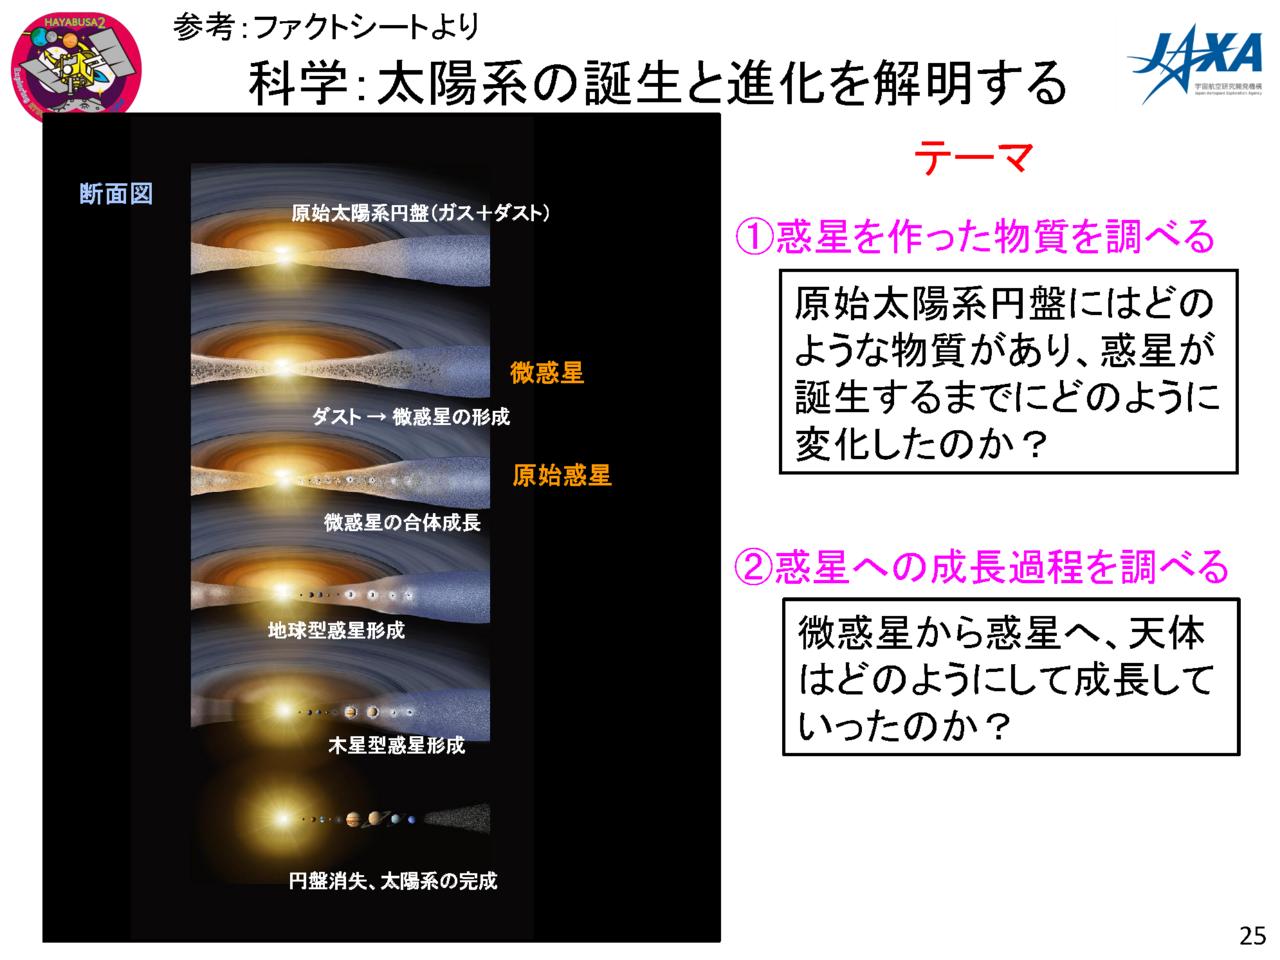 f:id:Imamura:20180719131720p:plain